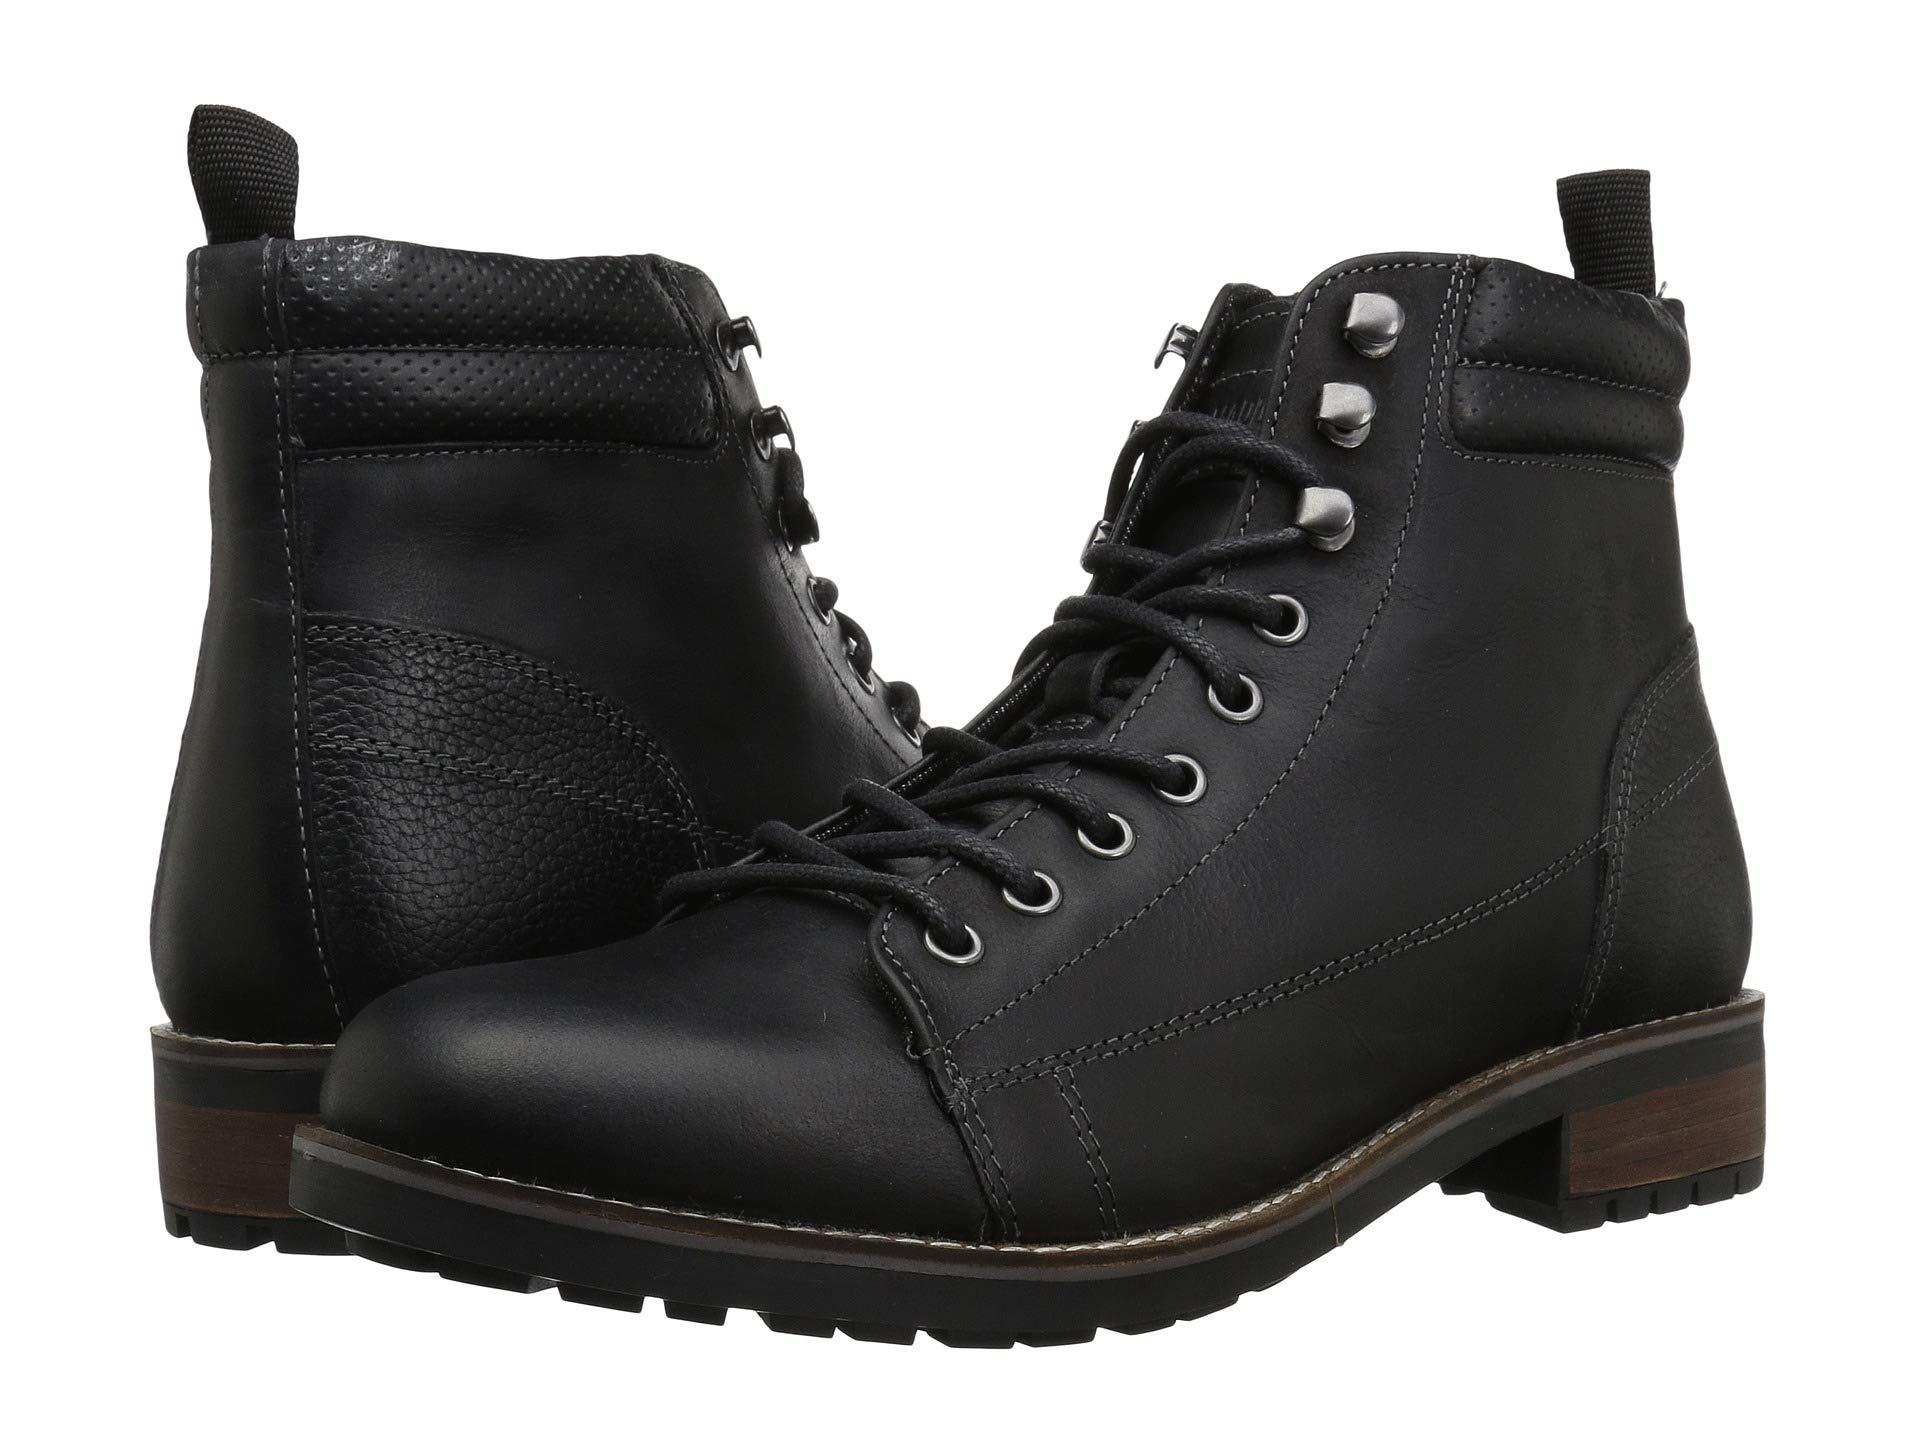 f5dff90dc62 Lyst - Steve Madden Lorne (cognac) Men s Boots in Black for Men